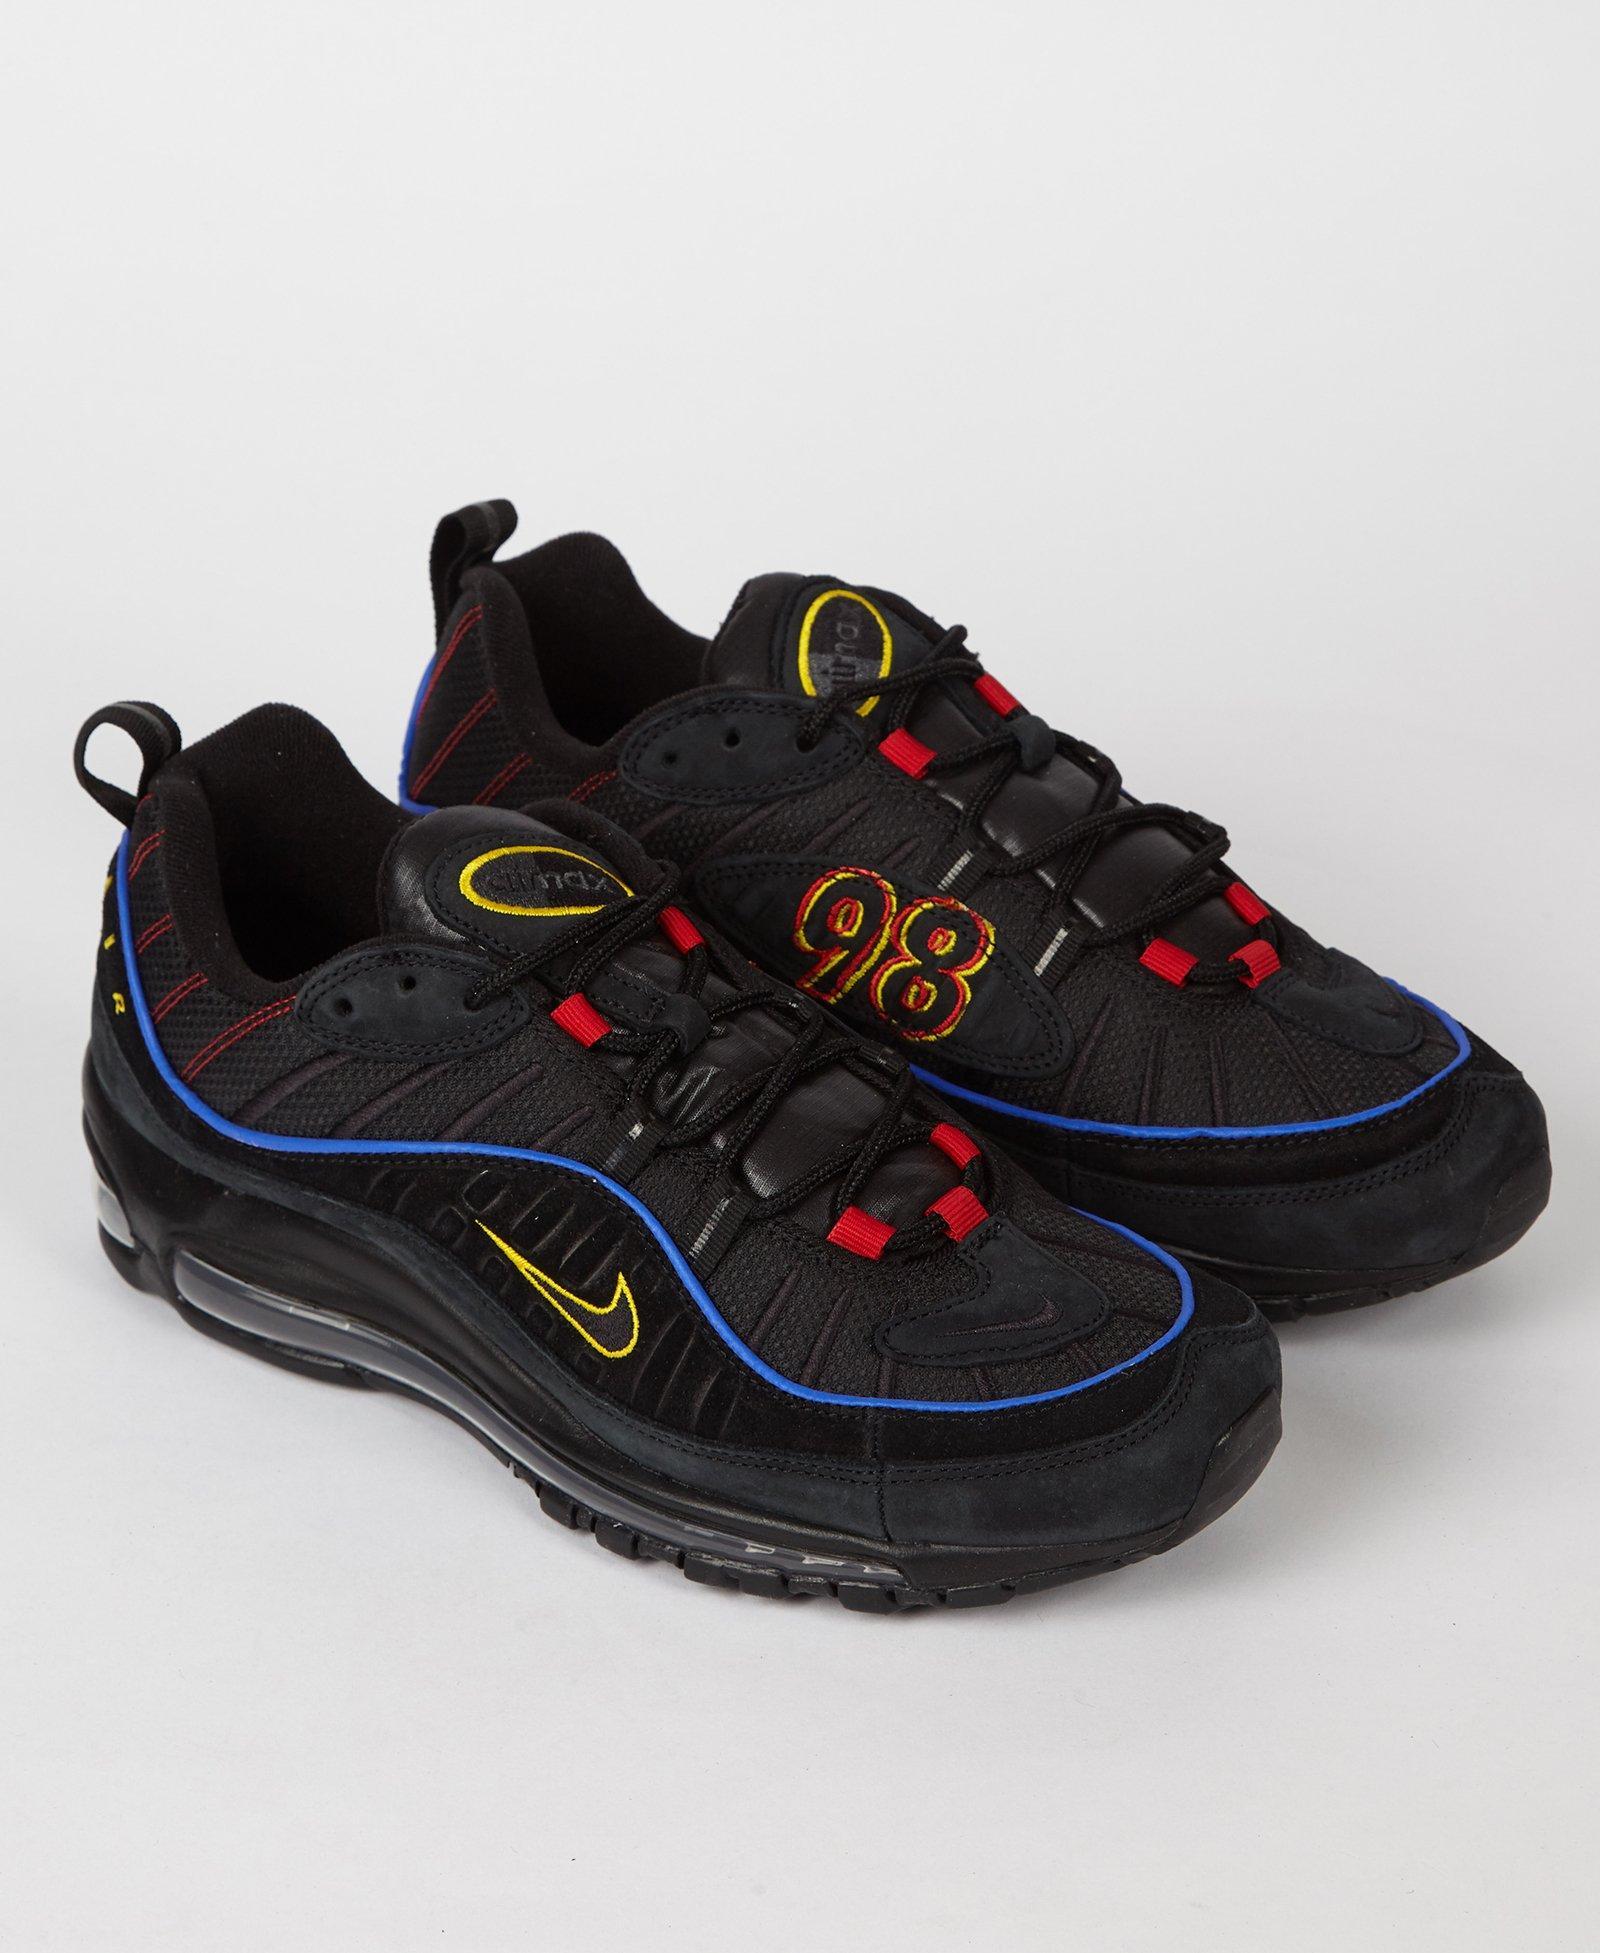 6bab8914478718 Lyst - Nike Air Max 98  amarillo  in Black for Men